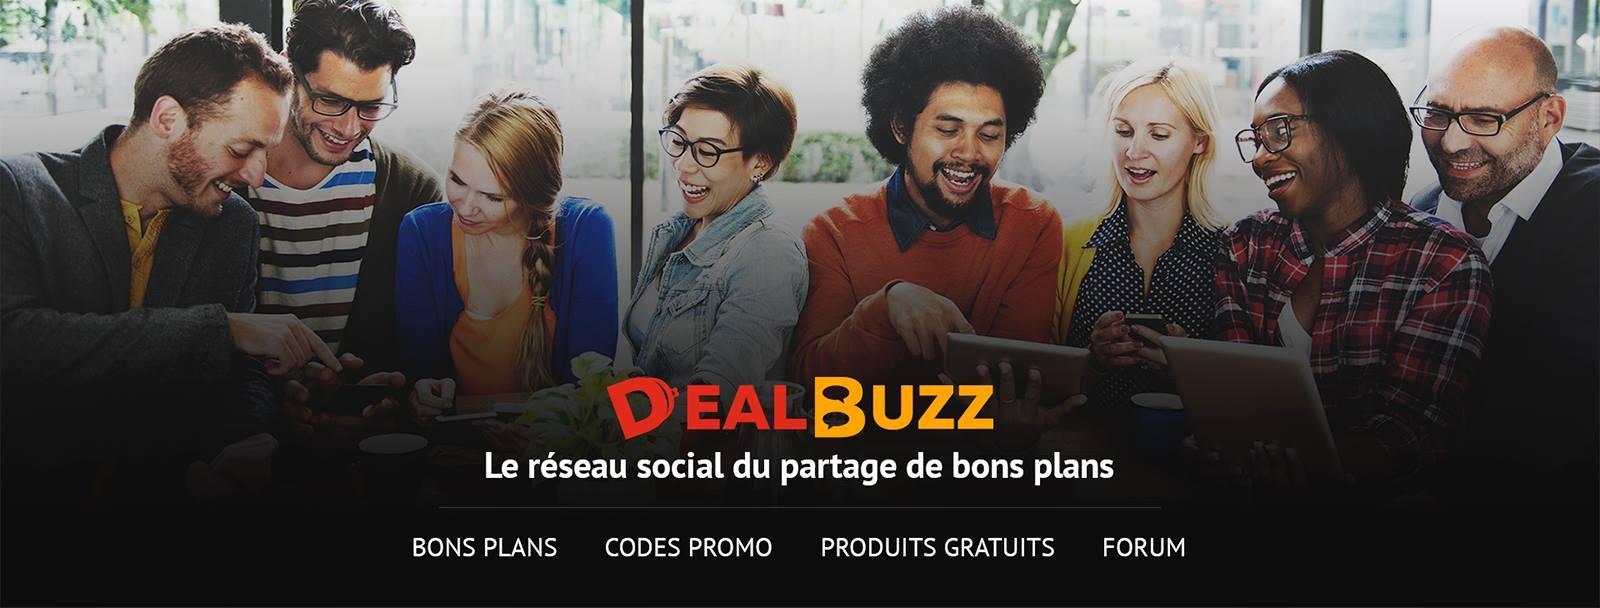 DealBuzz